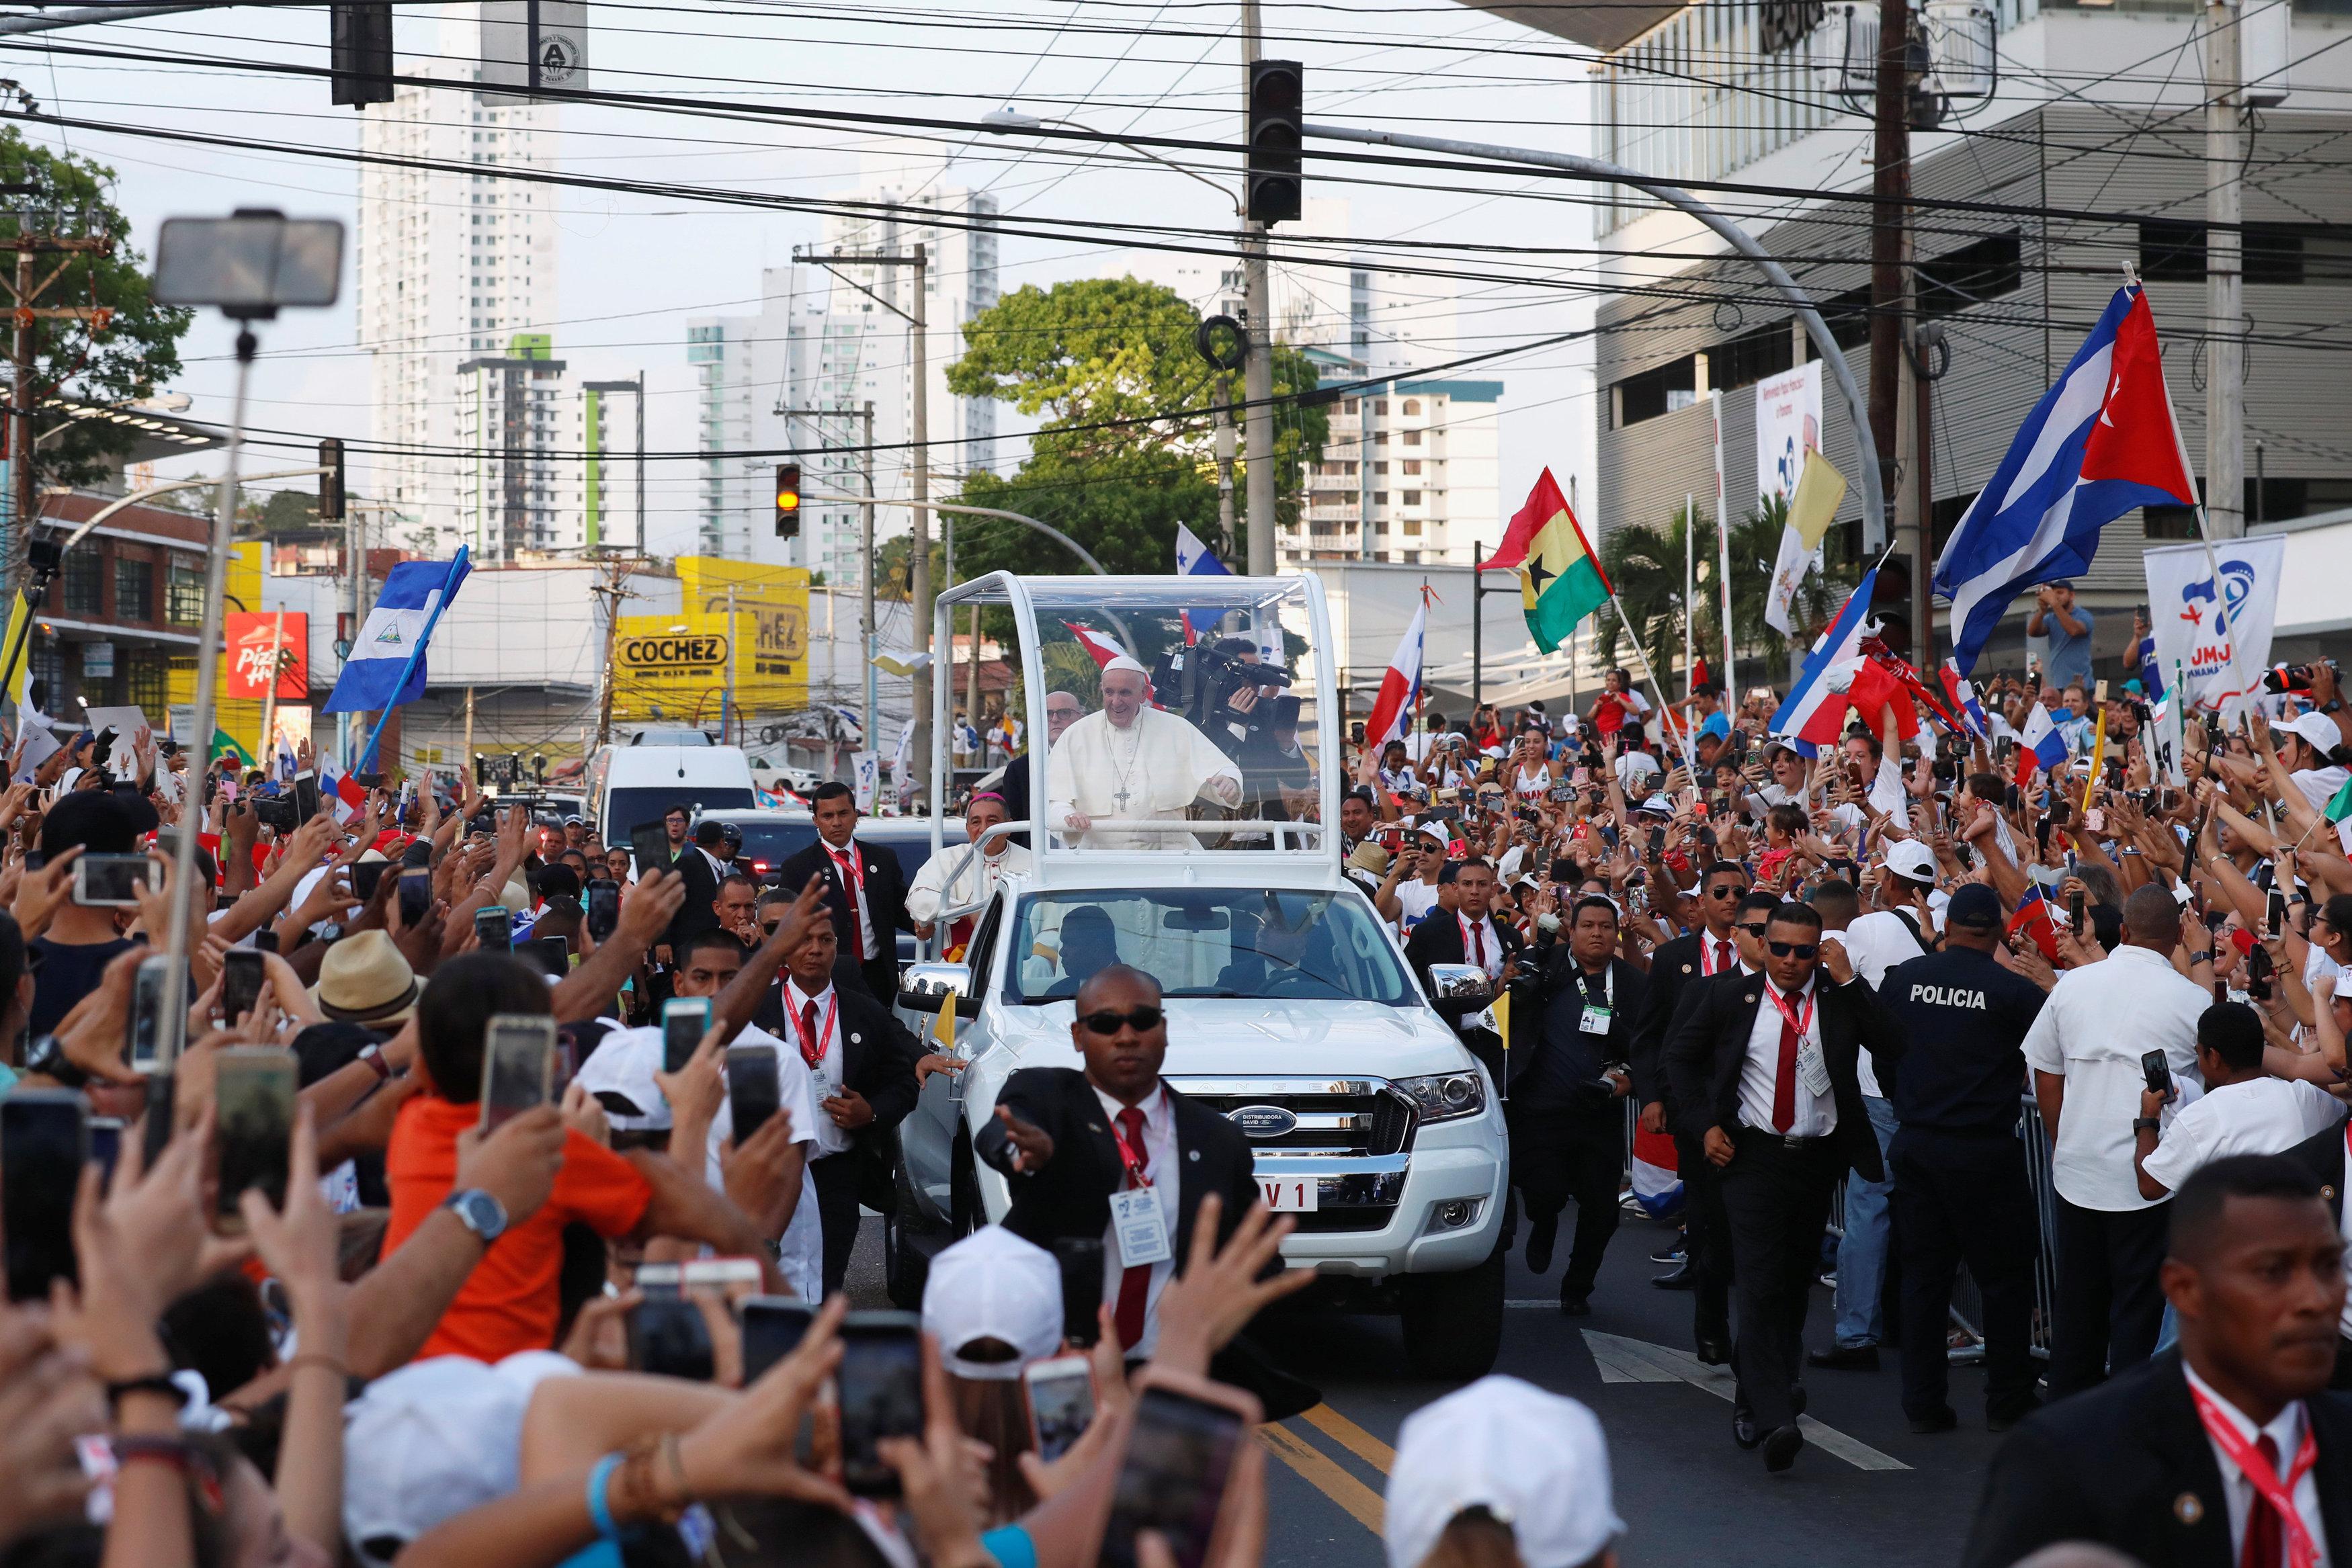 استقبال حاشد لبابا الفاتيكان لدى وصوله بنما  (3)